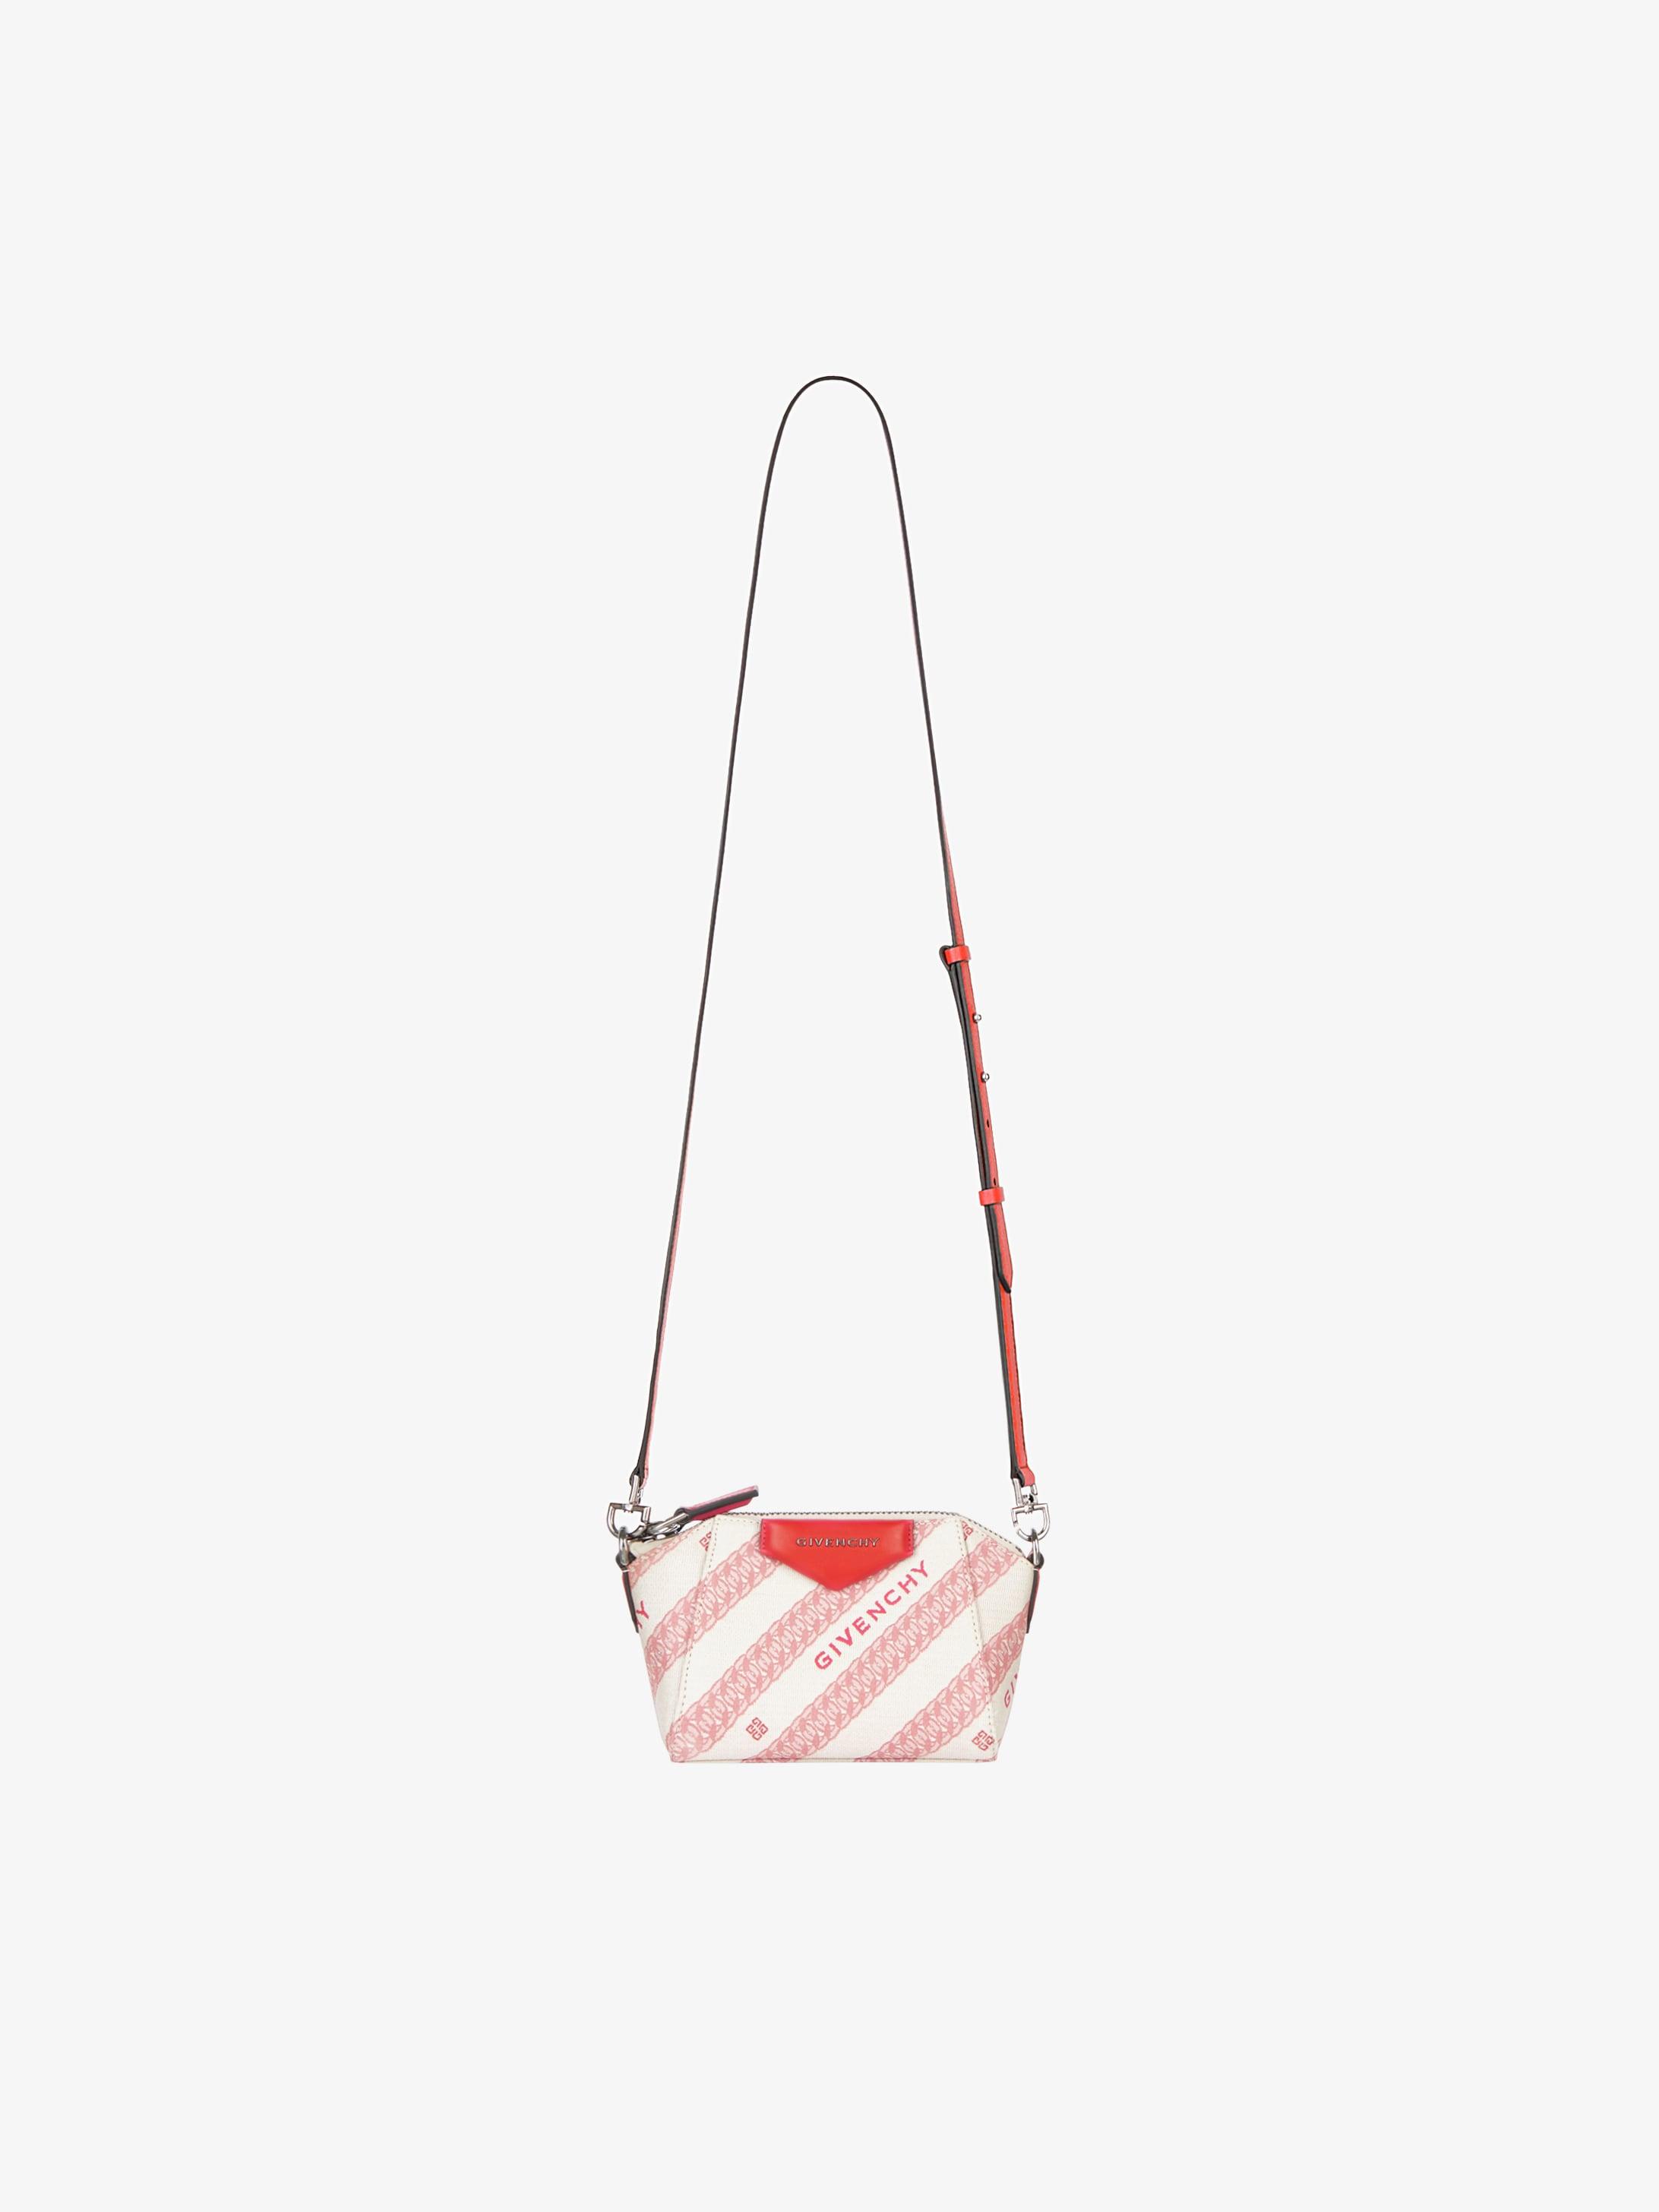 GIVENCHY Chain nano Antigona bag in jacquard